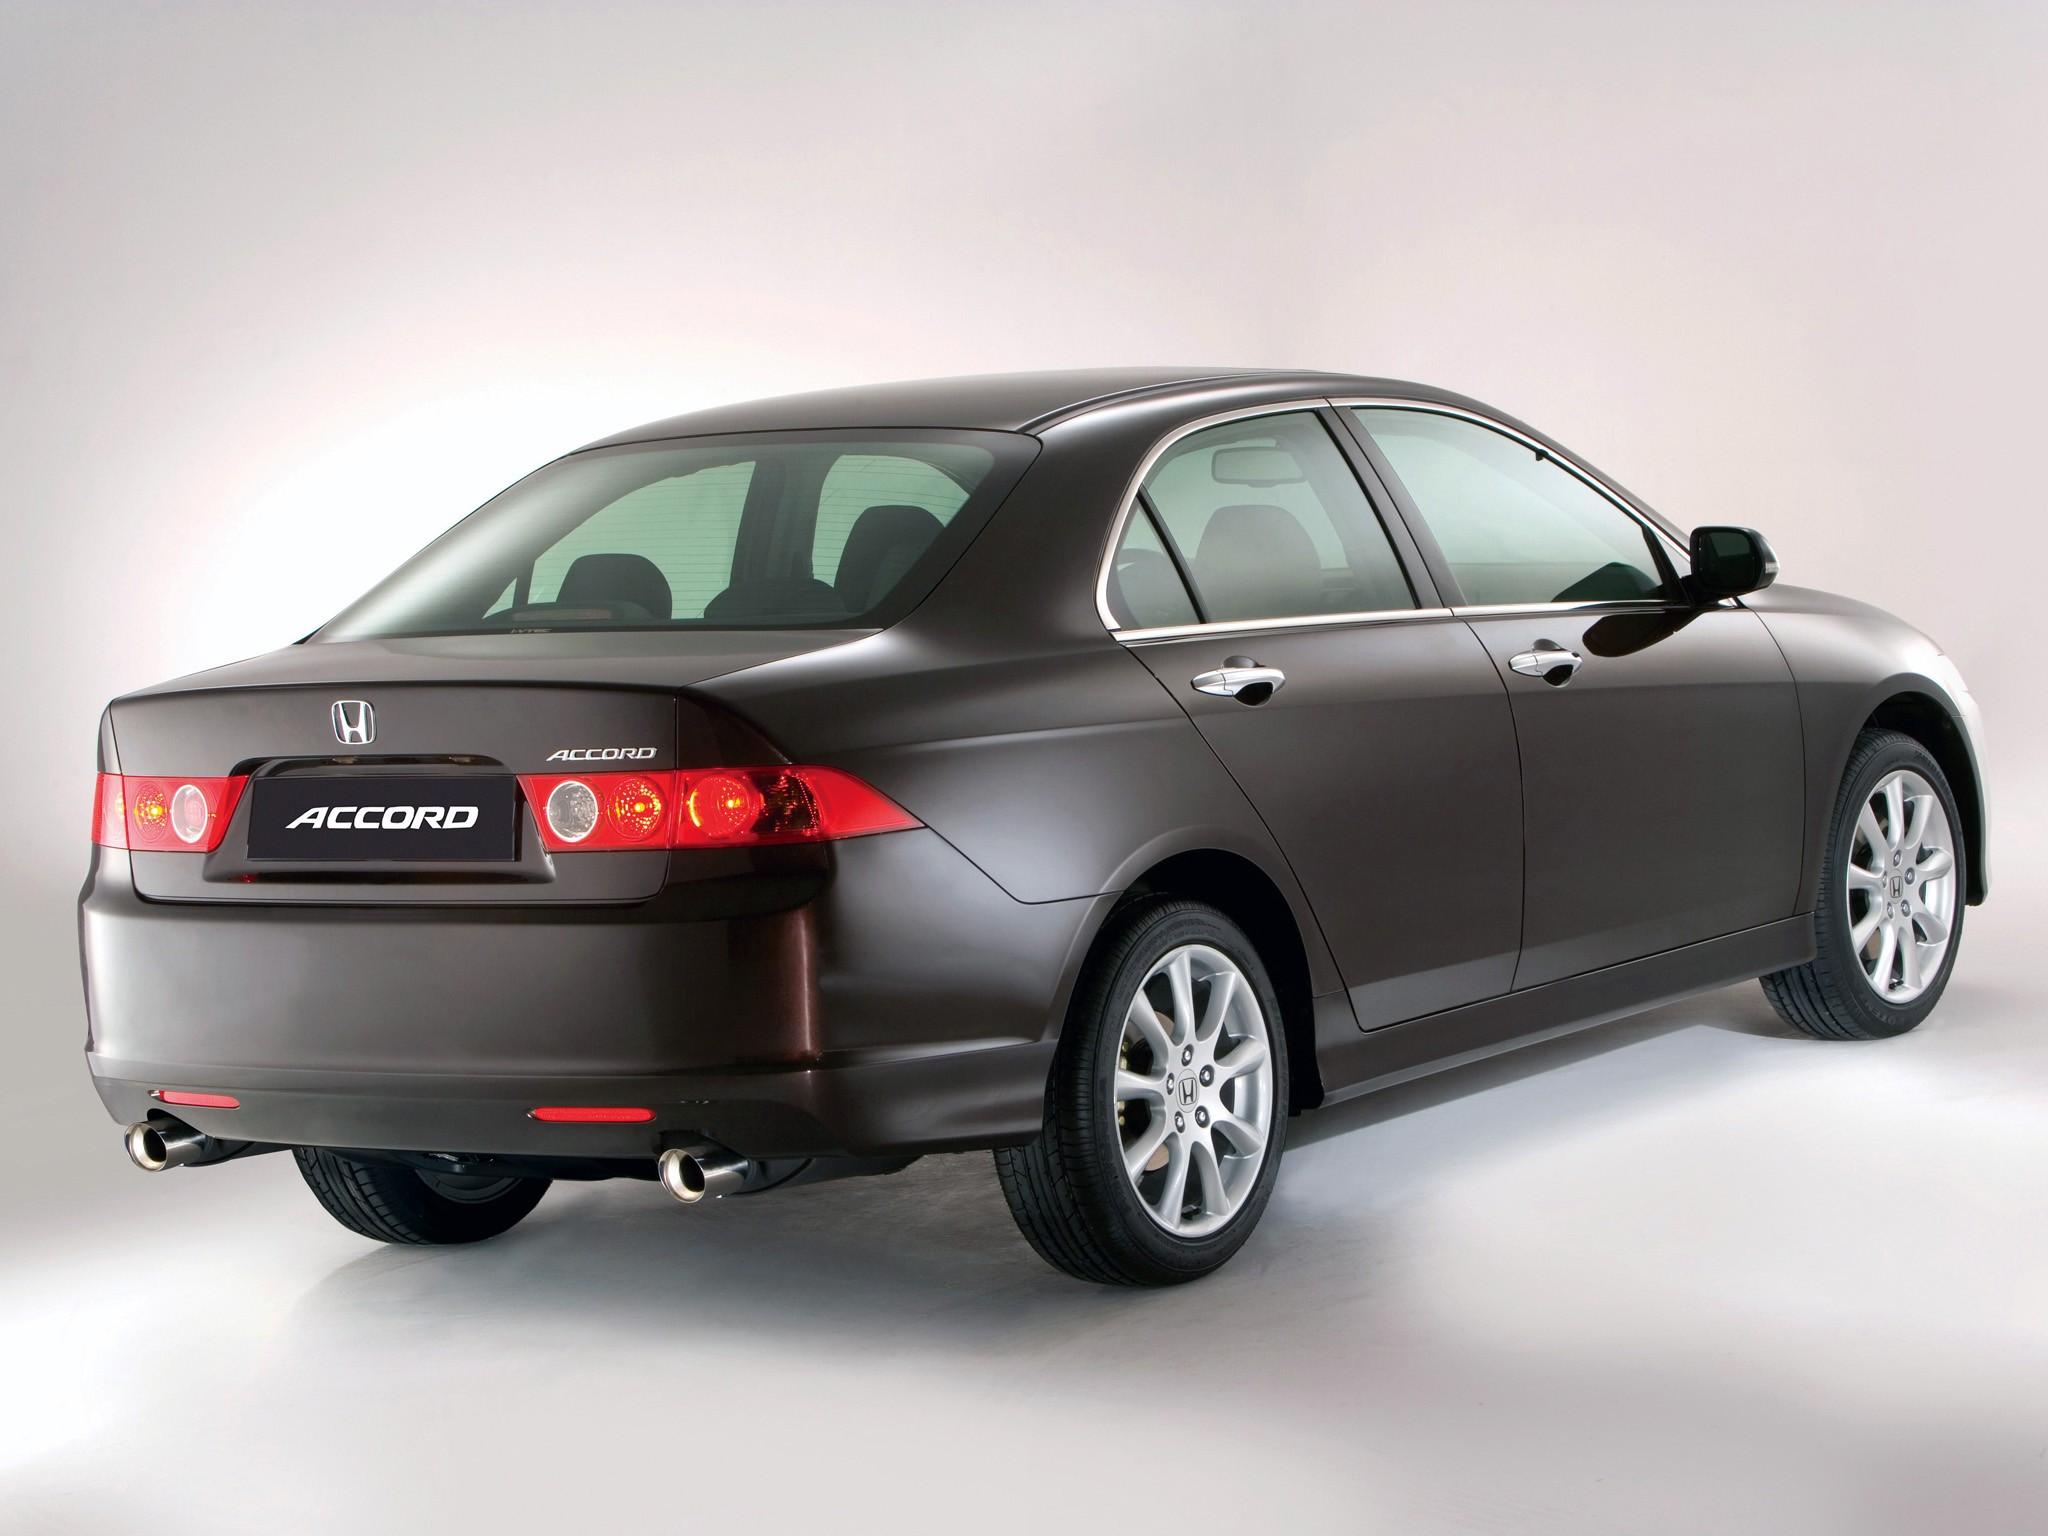 HONDA Accord 4 Doors - 2006, 2007, 2008 - autoevolution